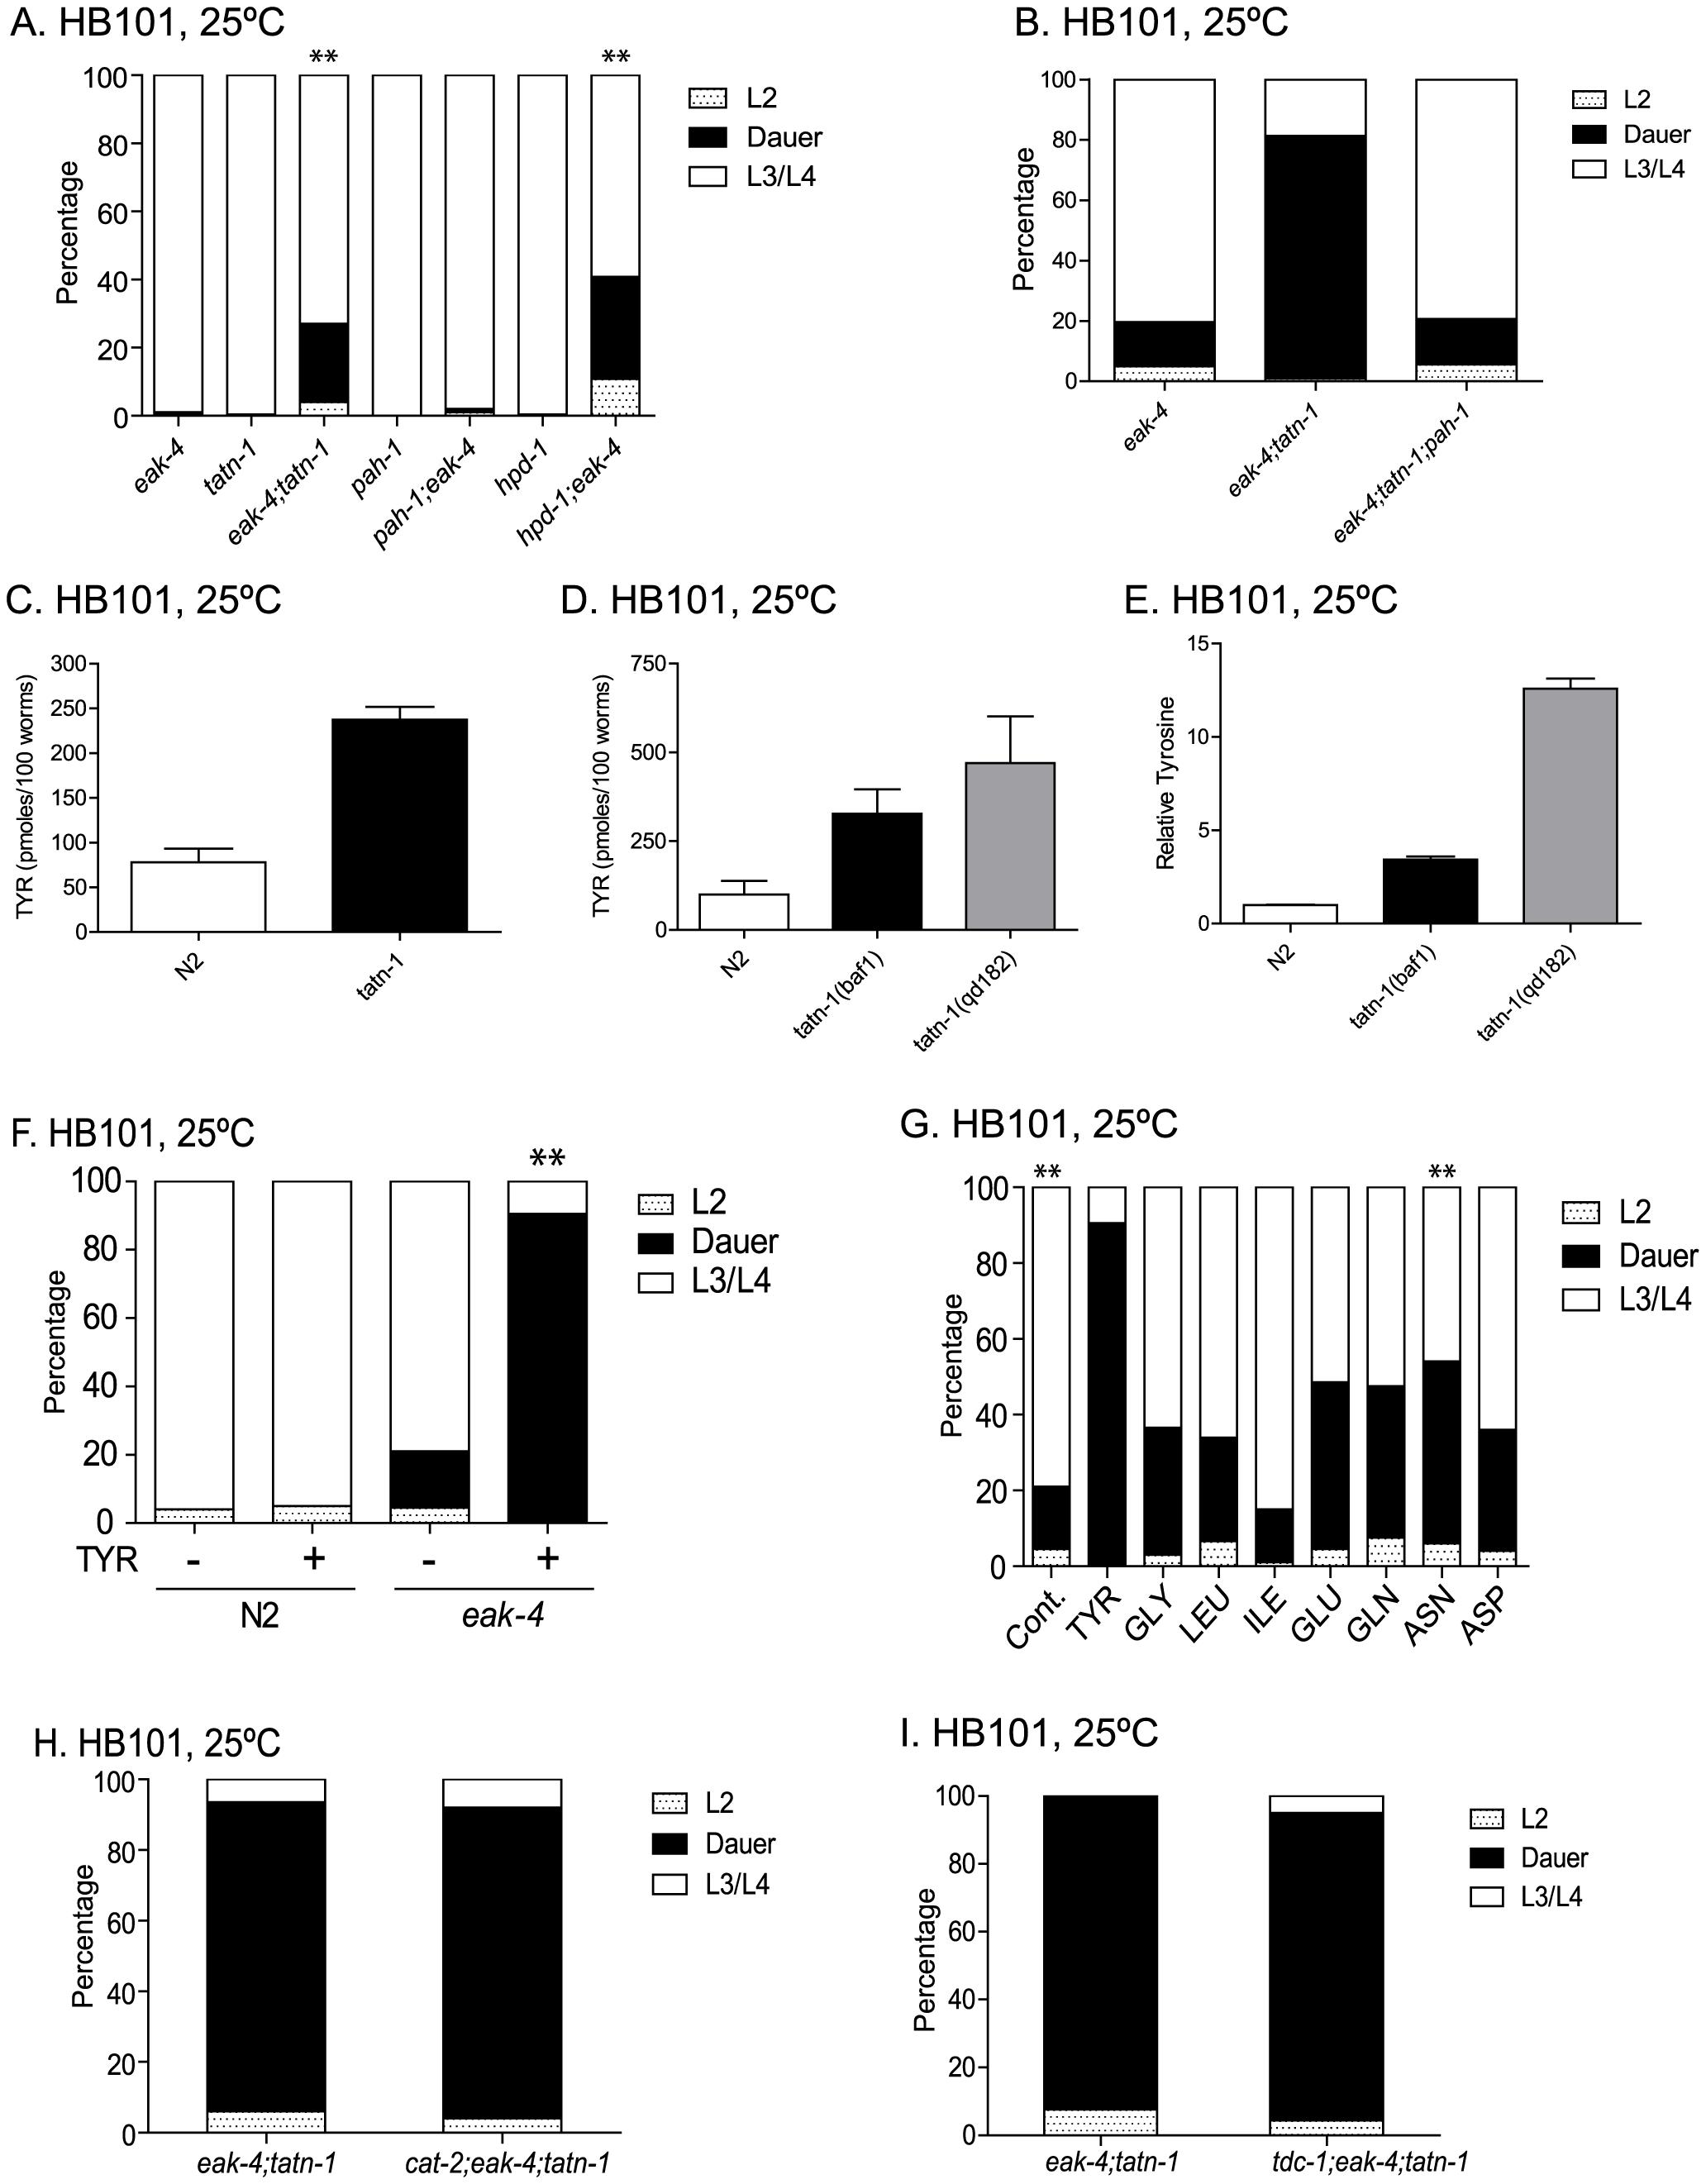 <i>tatn-1</i> acts by increasing tyrosine levels.